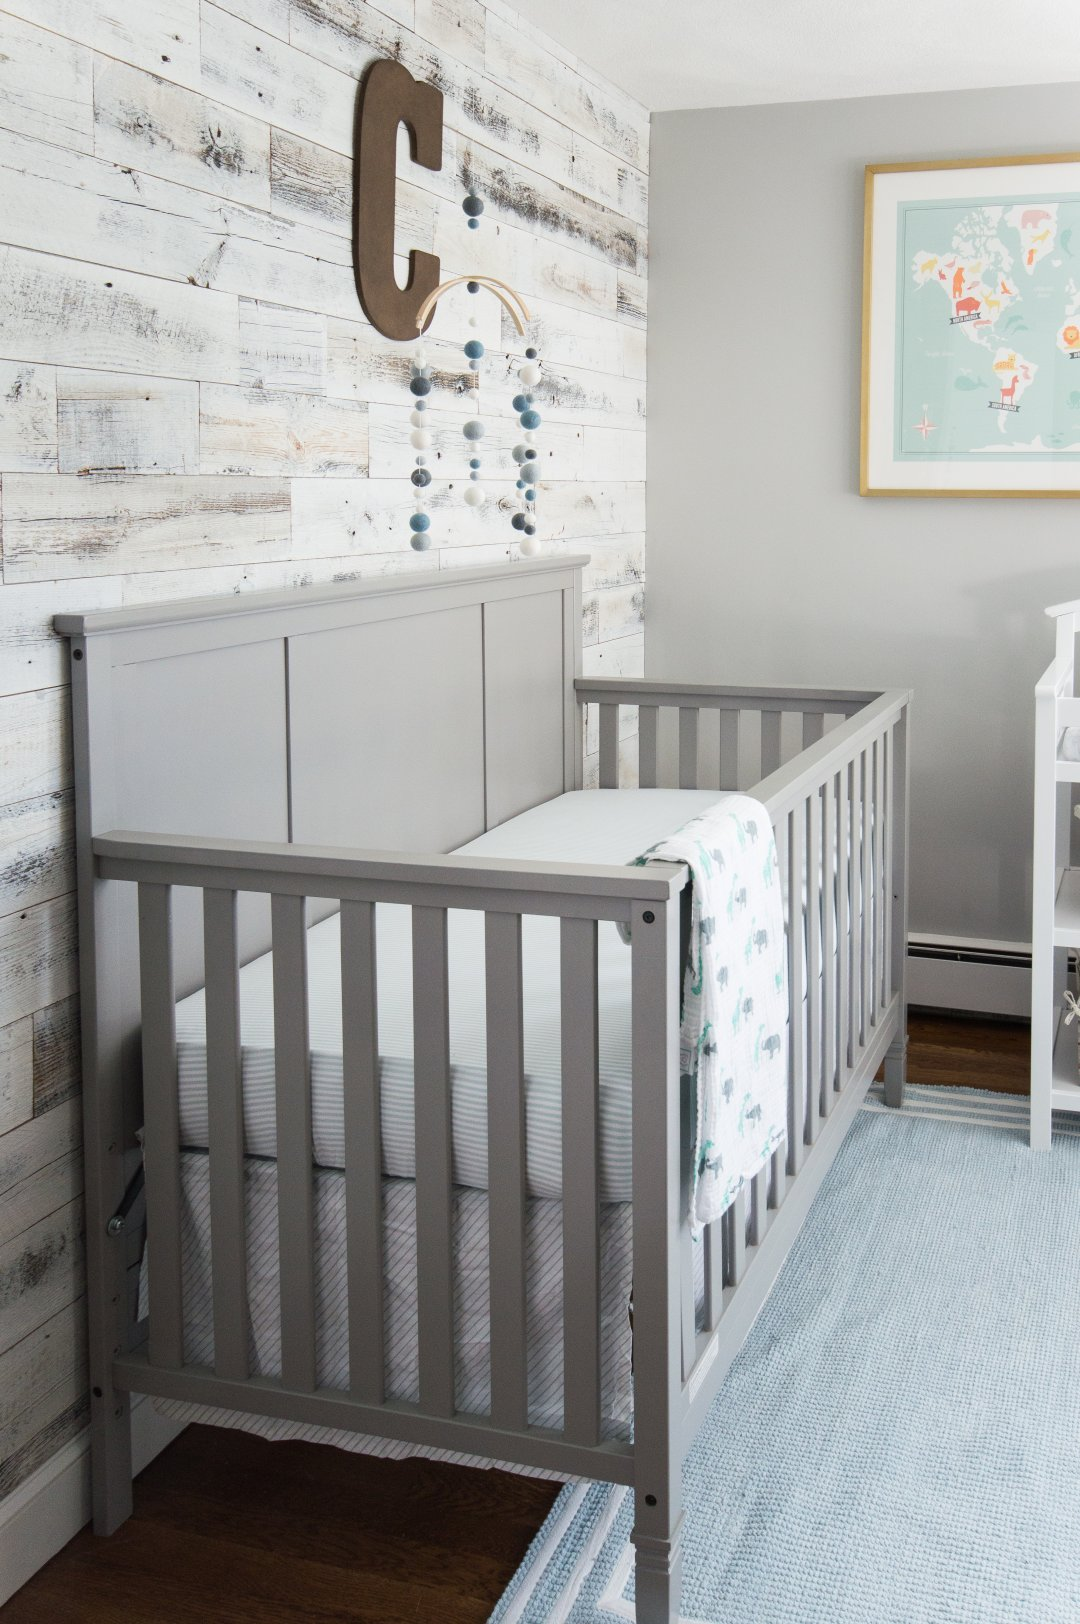 Baby Boy Nursery Reveal: A Modern Industrial Bue & Gray Nursery